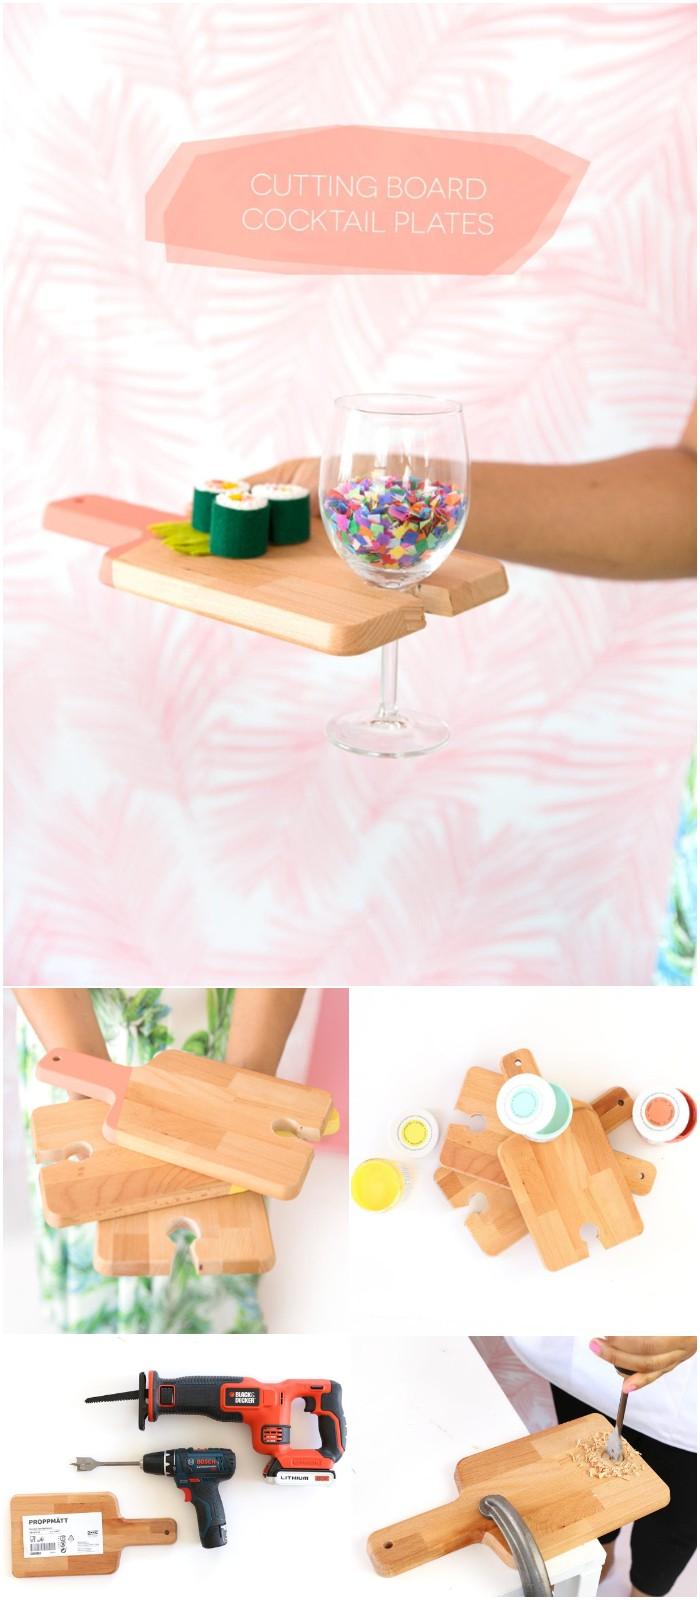 DIY Cutting Board Cocktail Plates